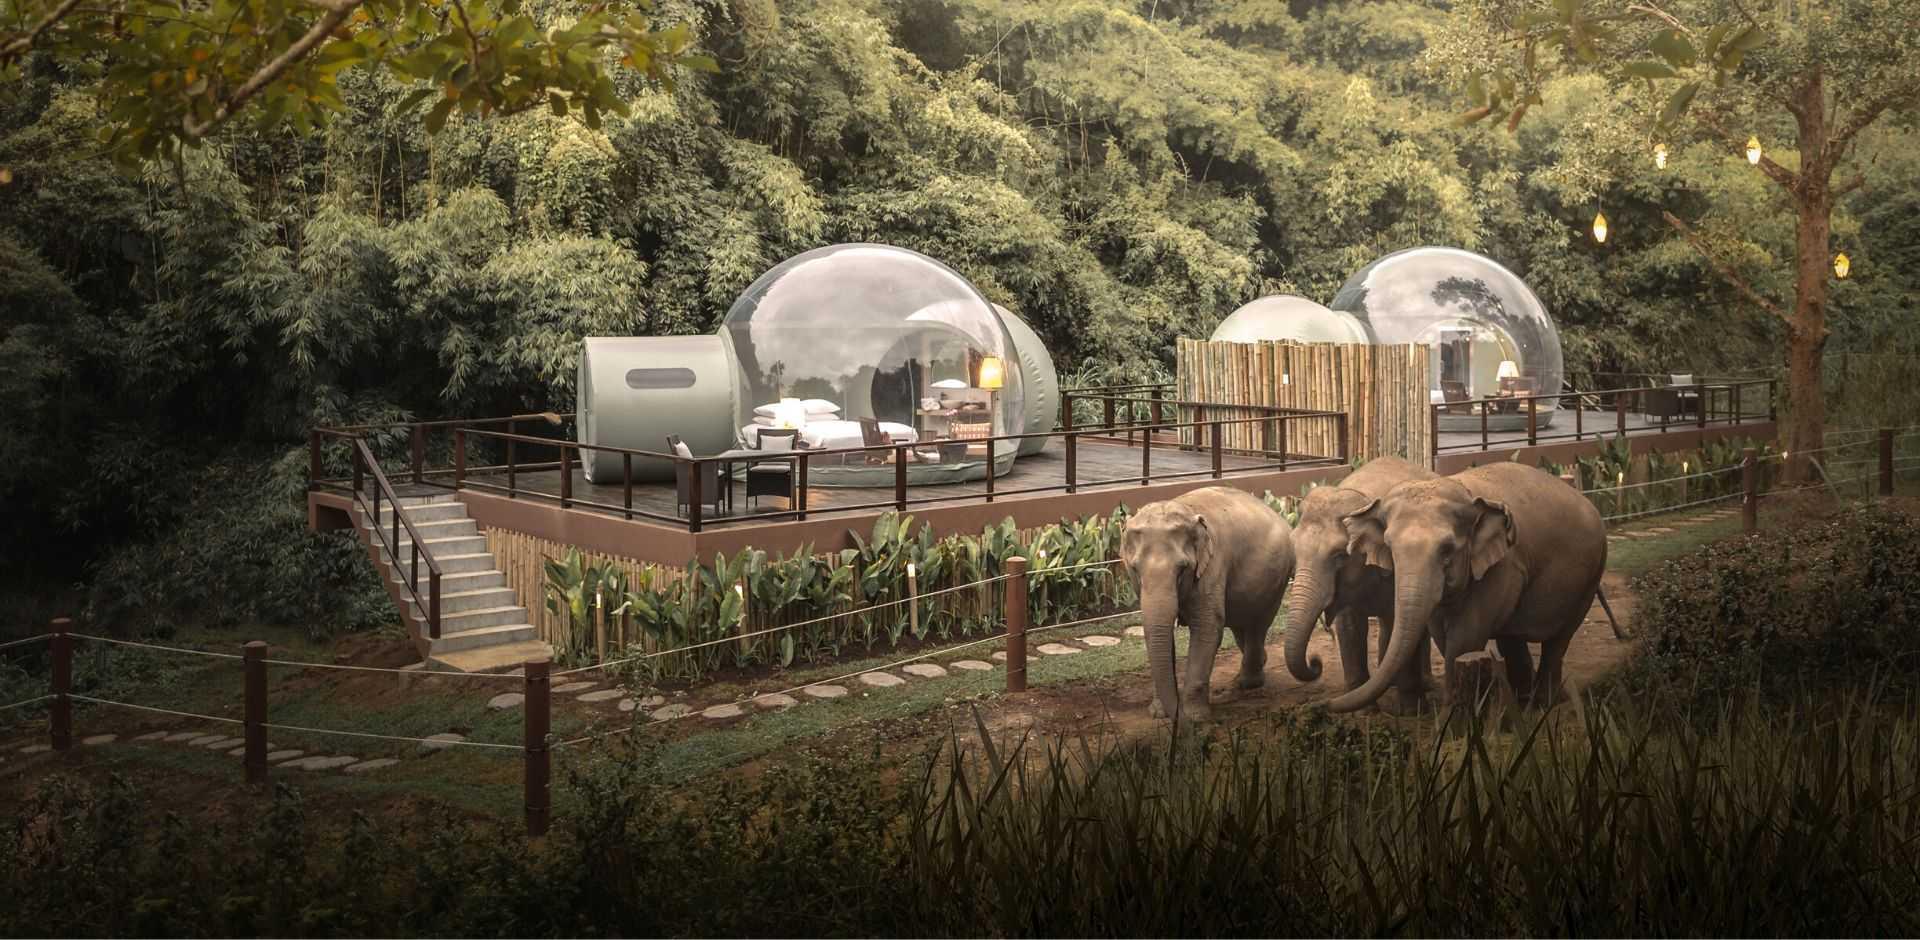 Anantara Golden Triangle Elephant Camp & Resort   Chiang Rai Thailand Luxury Hotels Resorts   Remote Lands